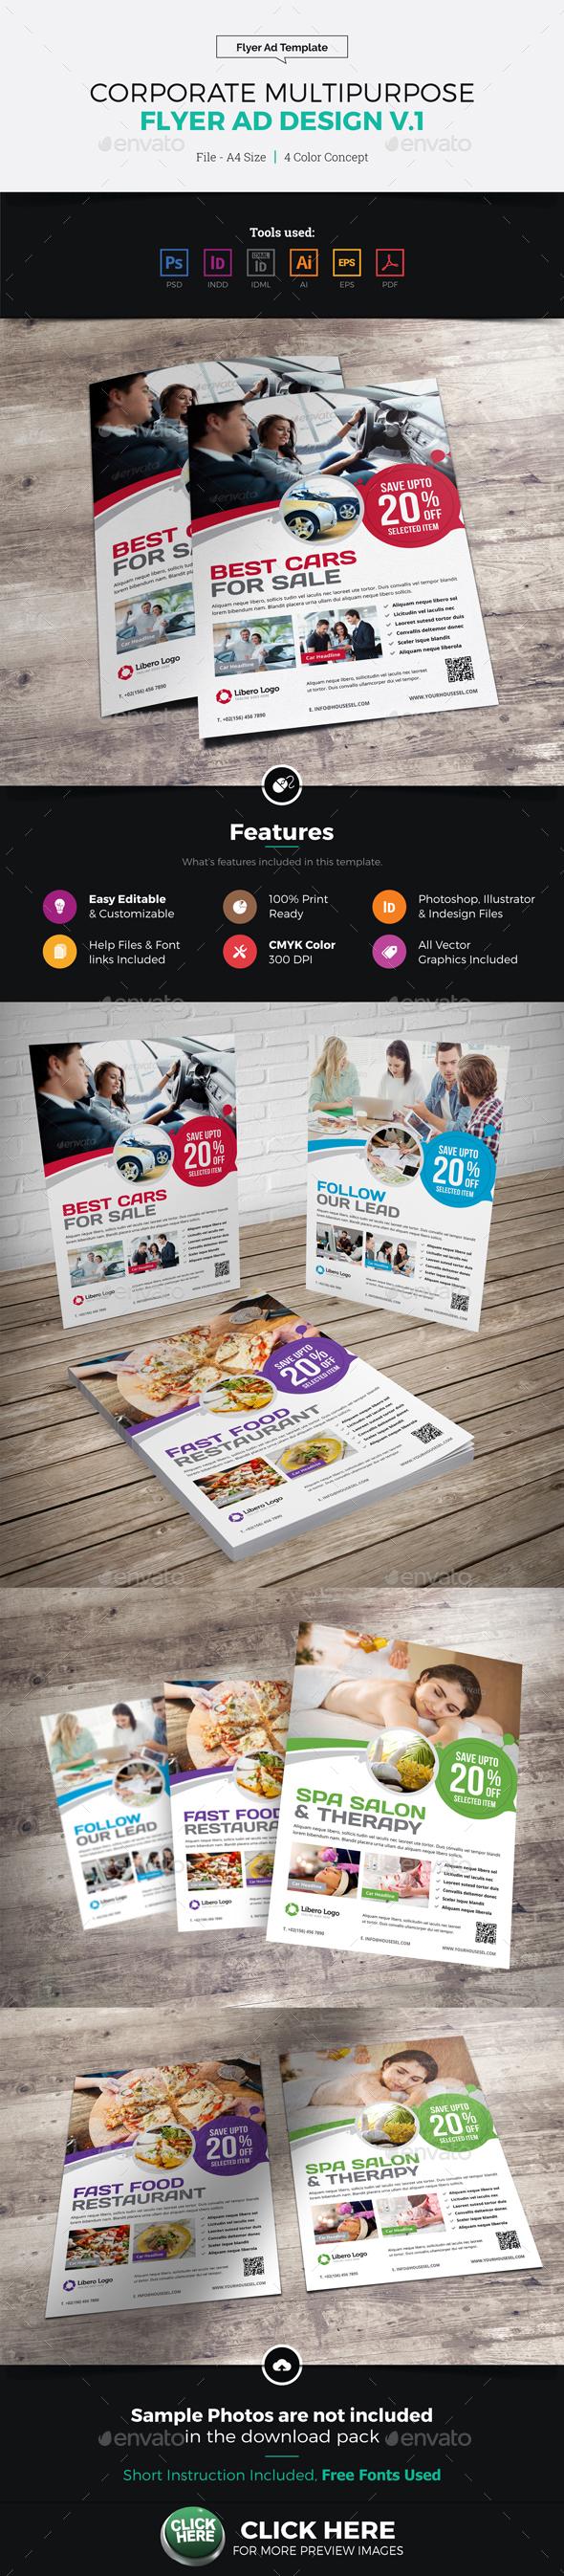 Corporate Multipurpose Flyer Ad Design v1 - Corporate Flyers